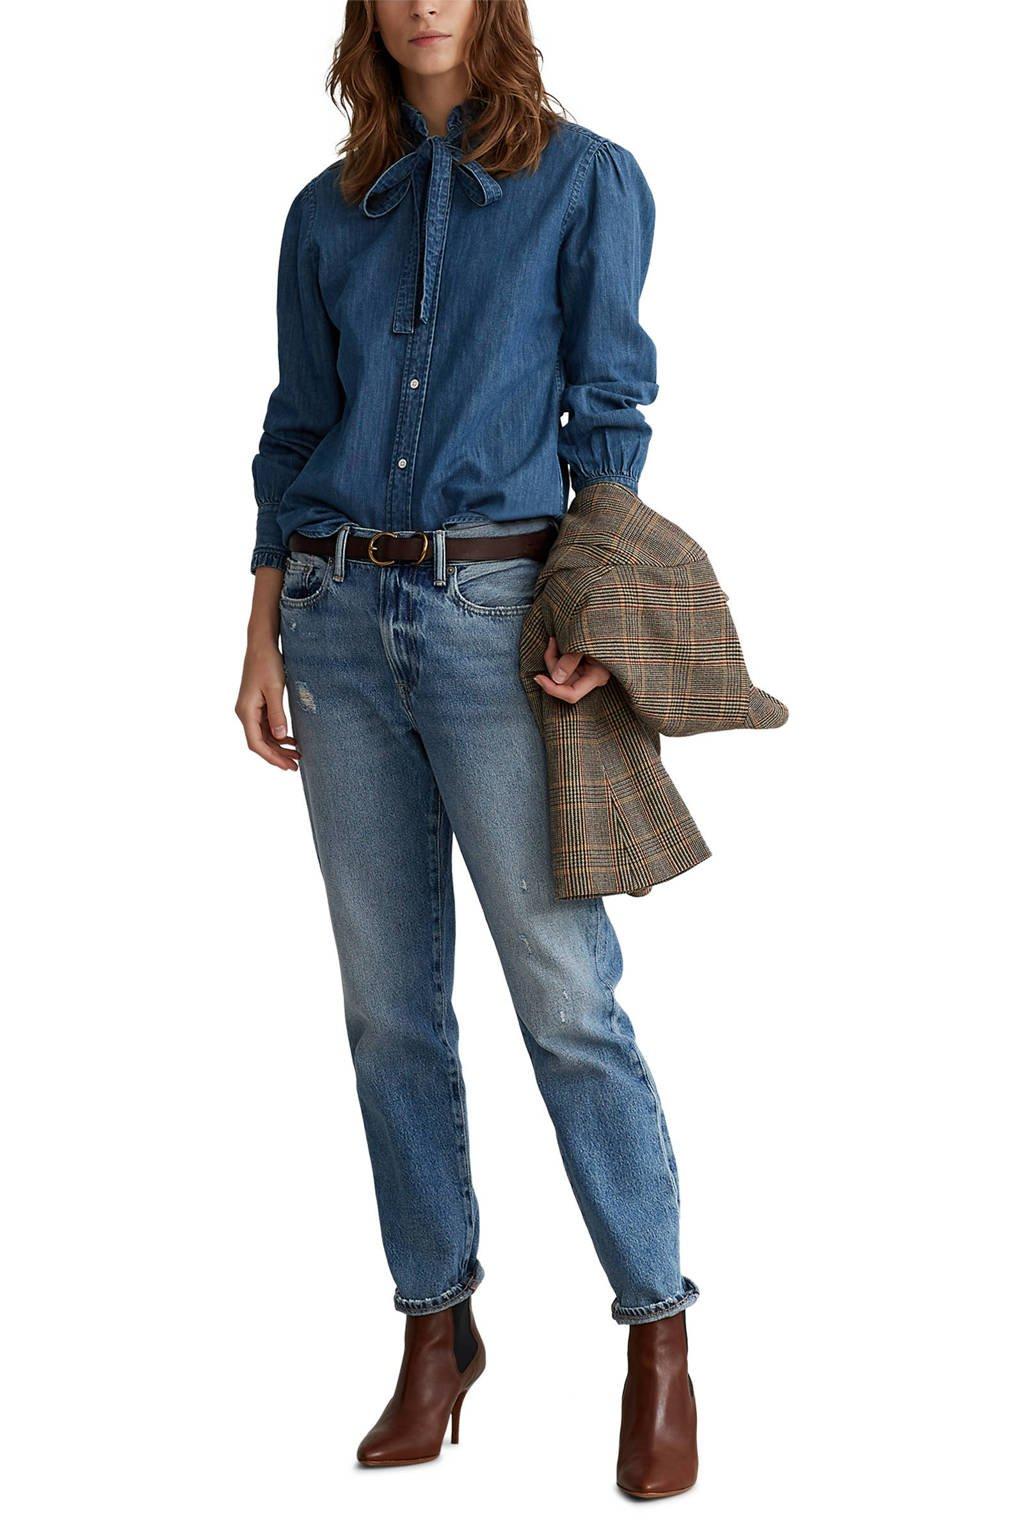 POLO Ralph Lauren blouse met ruches blauw, Blauw